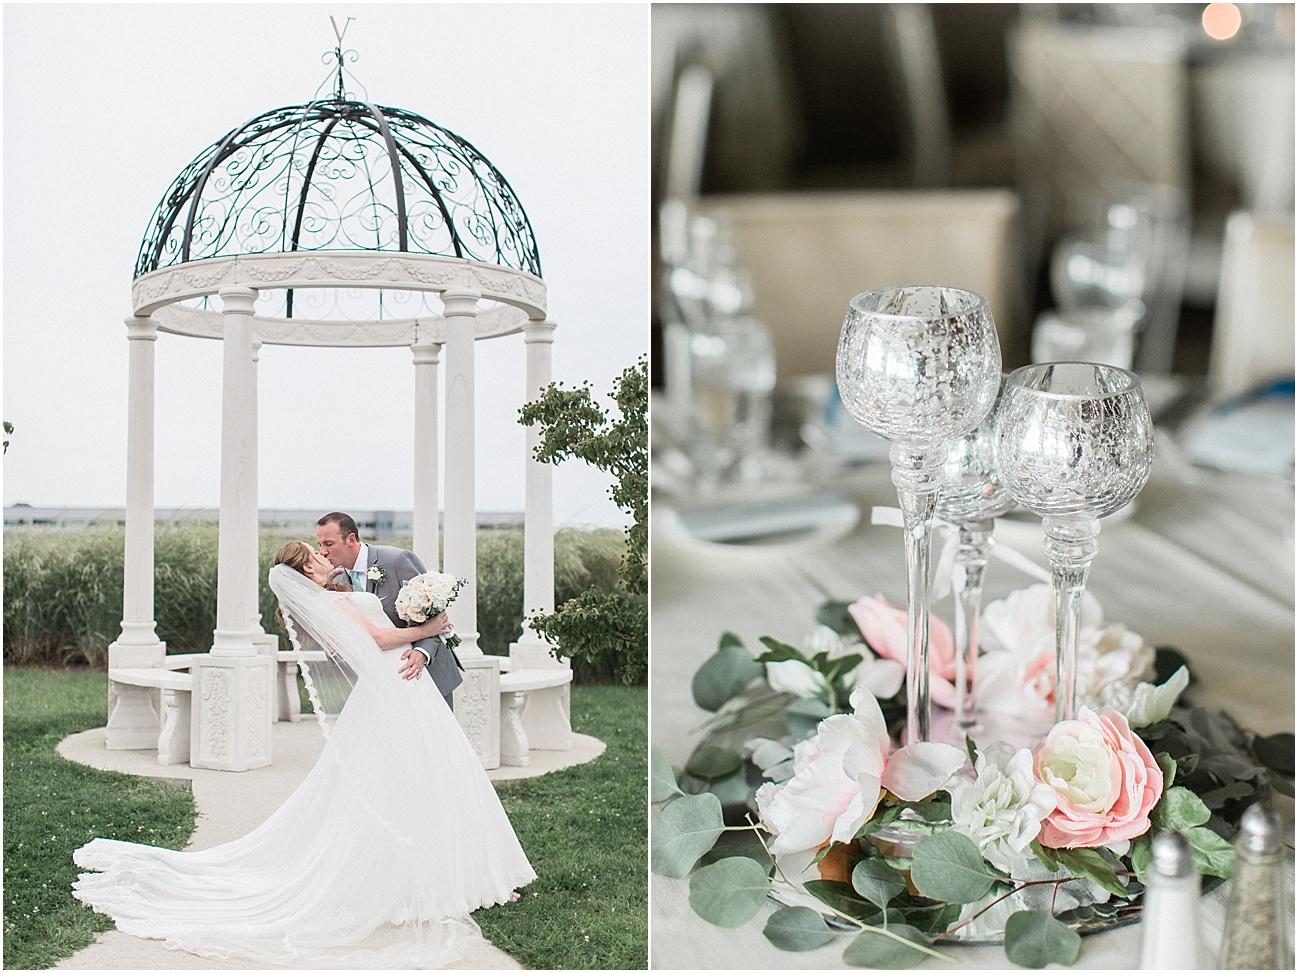 jaclyn_adam_st_ann_brendans_dorchester_southie_castle_bride_groom_venezia_waterfront__cape_cod_boston_wedding_photographer_meredith_jane_photography_photo_0912.jpg